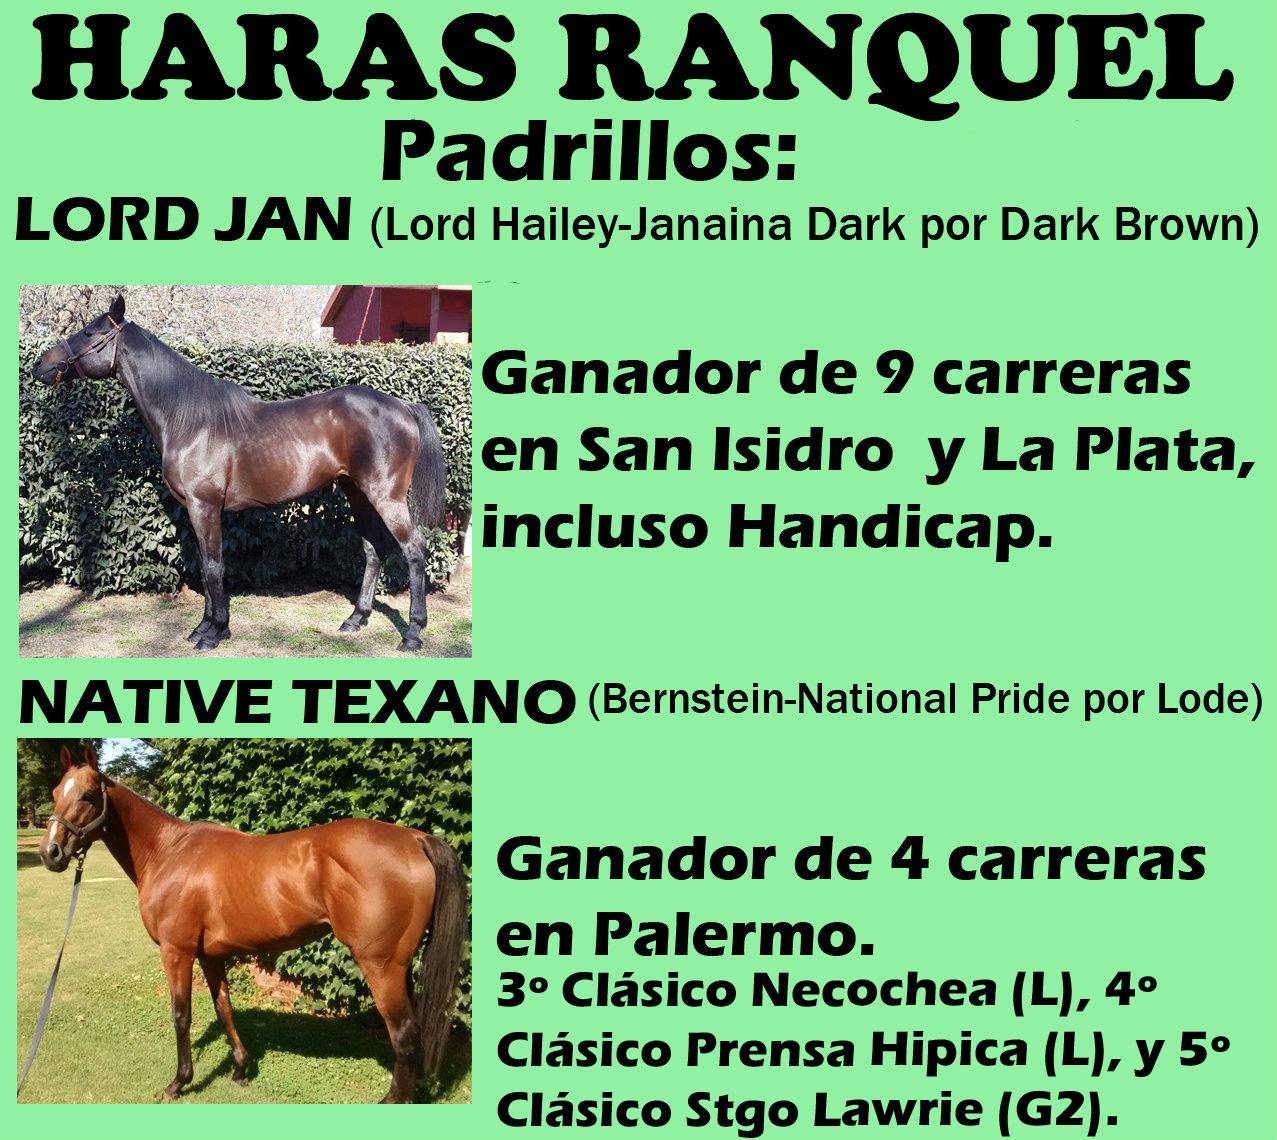 HS RANQUEL PADRILLOS 1